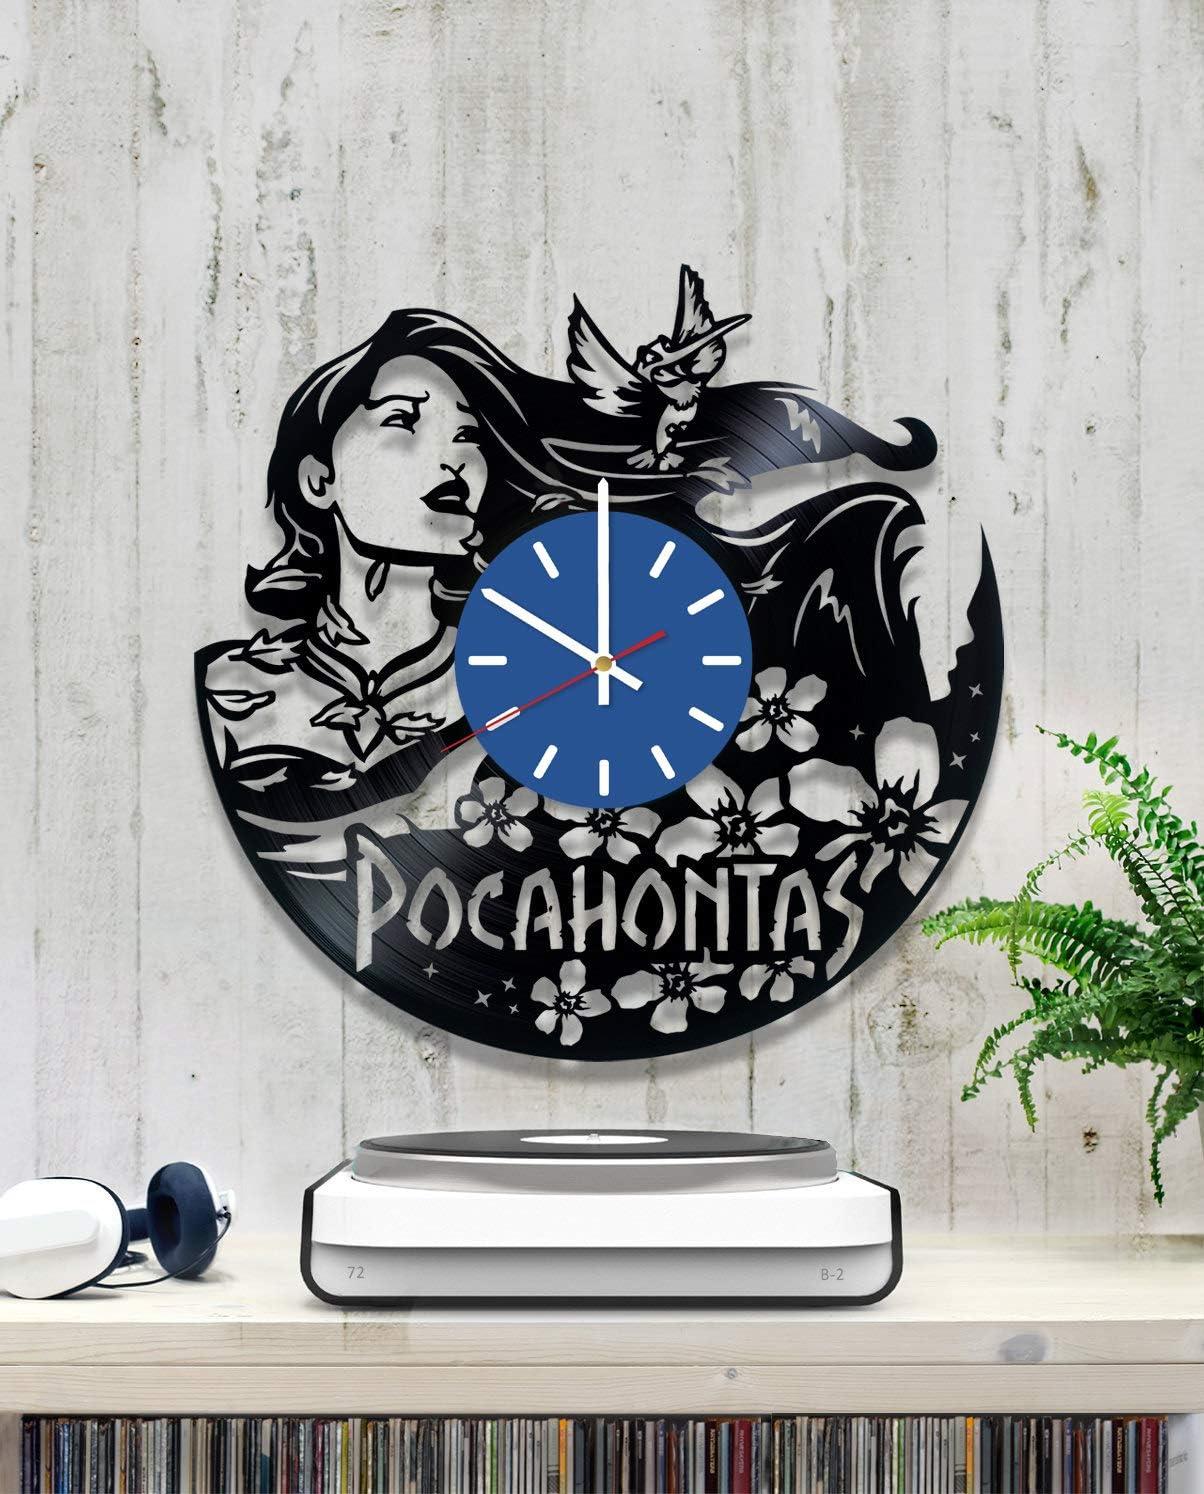 MKG Studio Vinyl Record Wall Clock Pocahontas Princess Matoaka Daughter of a Native American Paramount Chie 12 INCHES Decor Home Idea Handmade Gift for Her Him